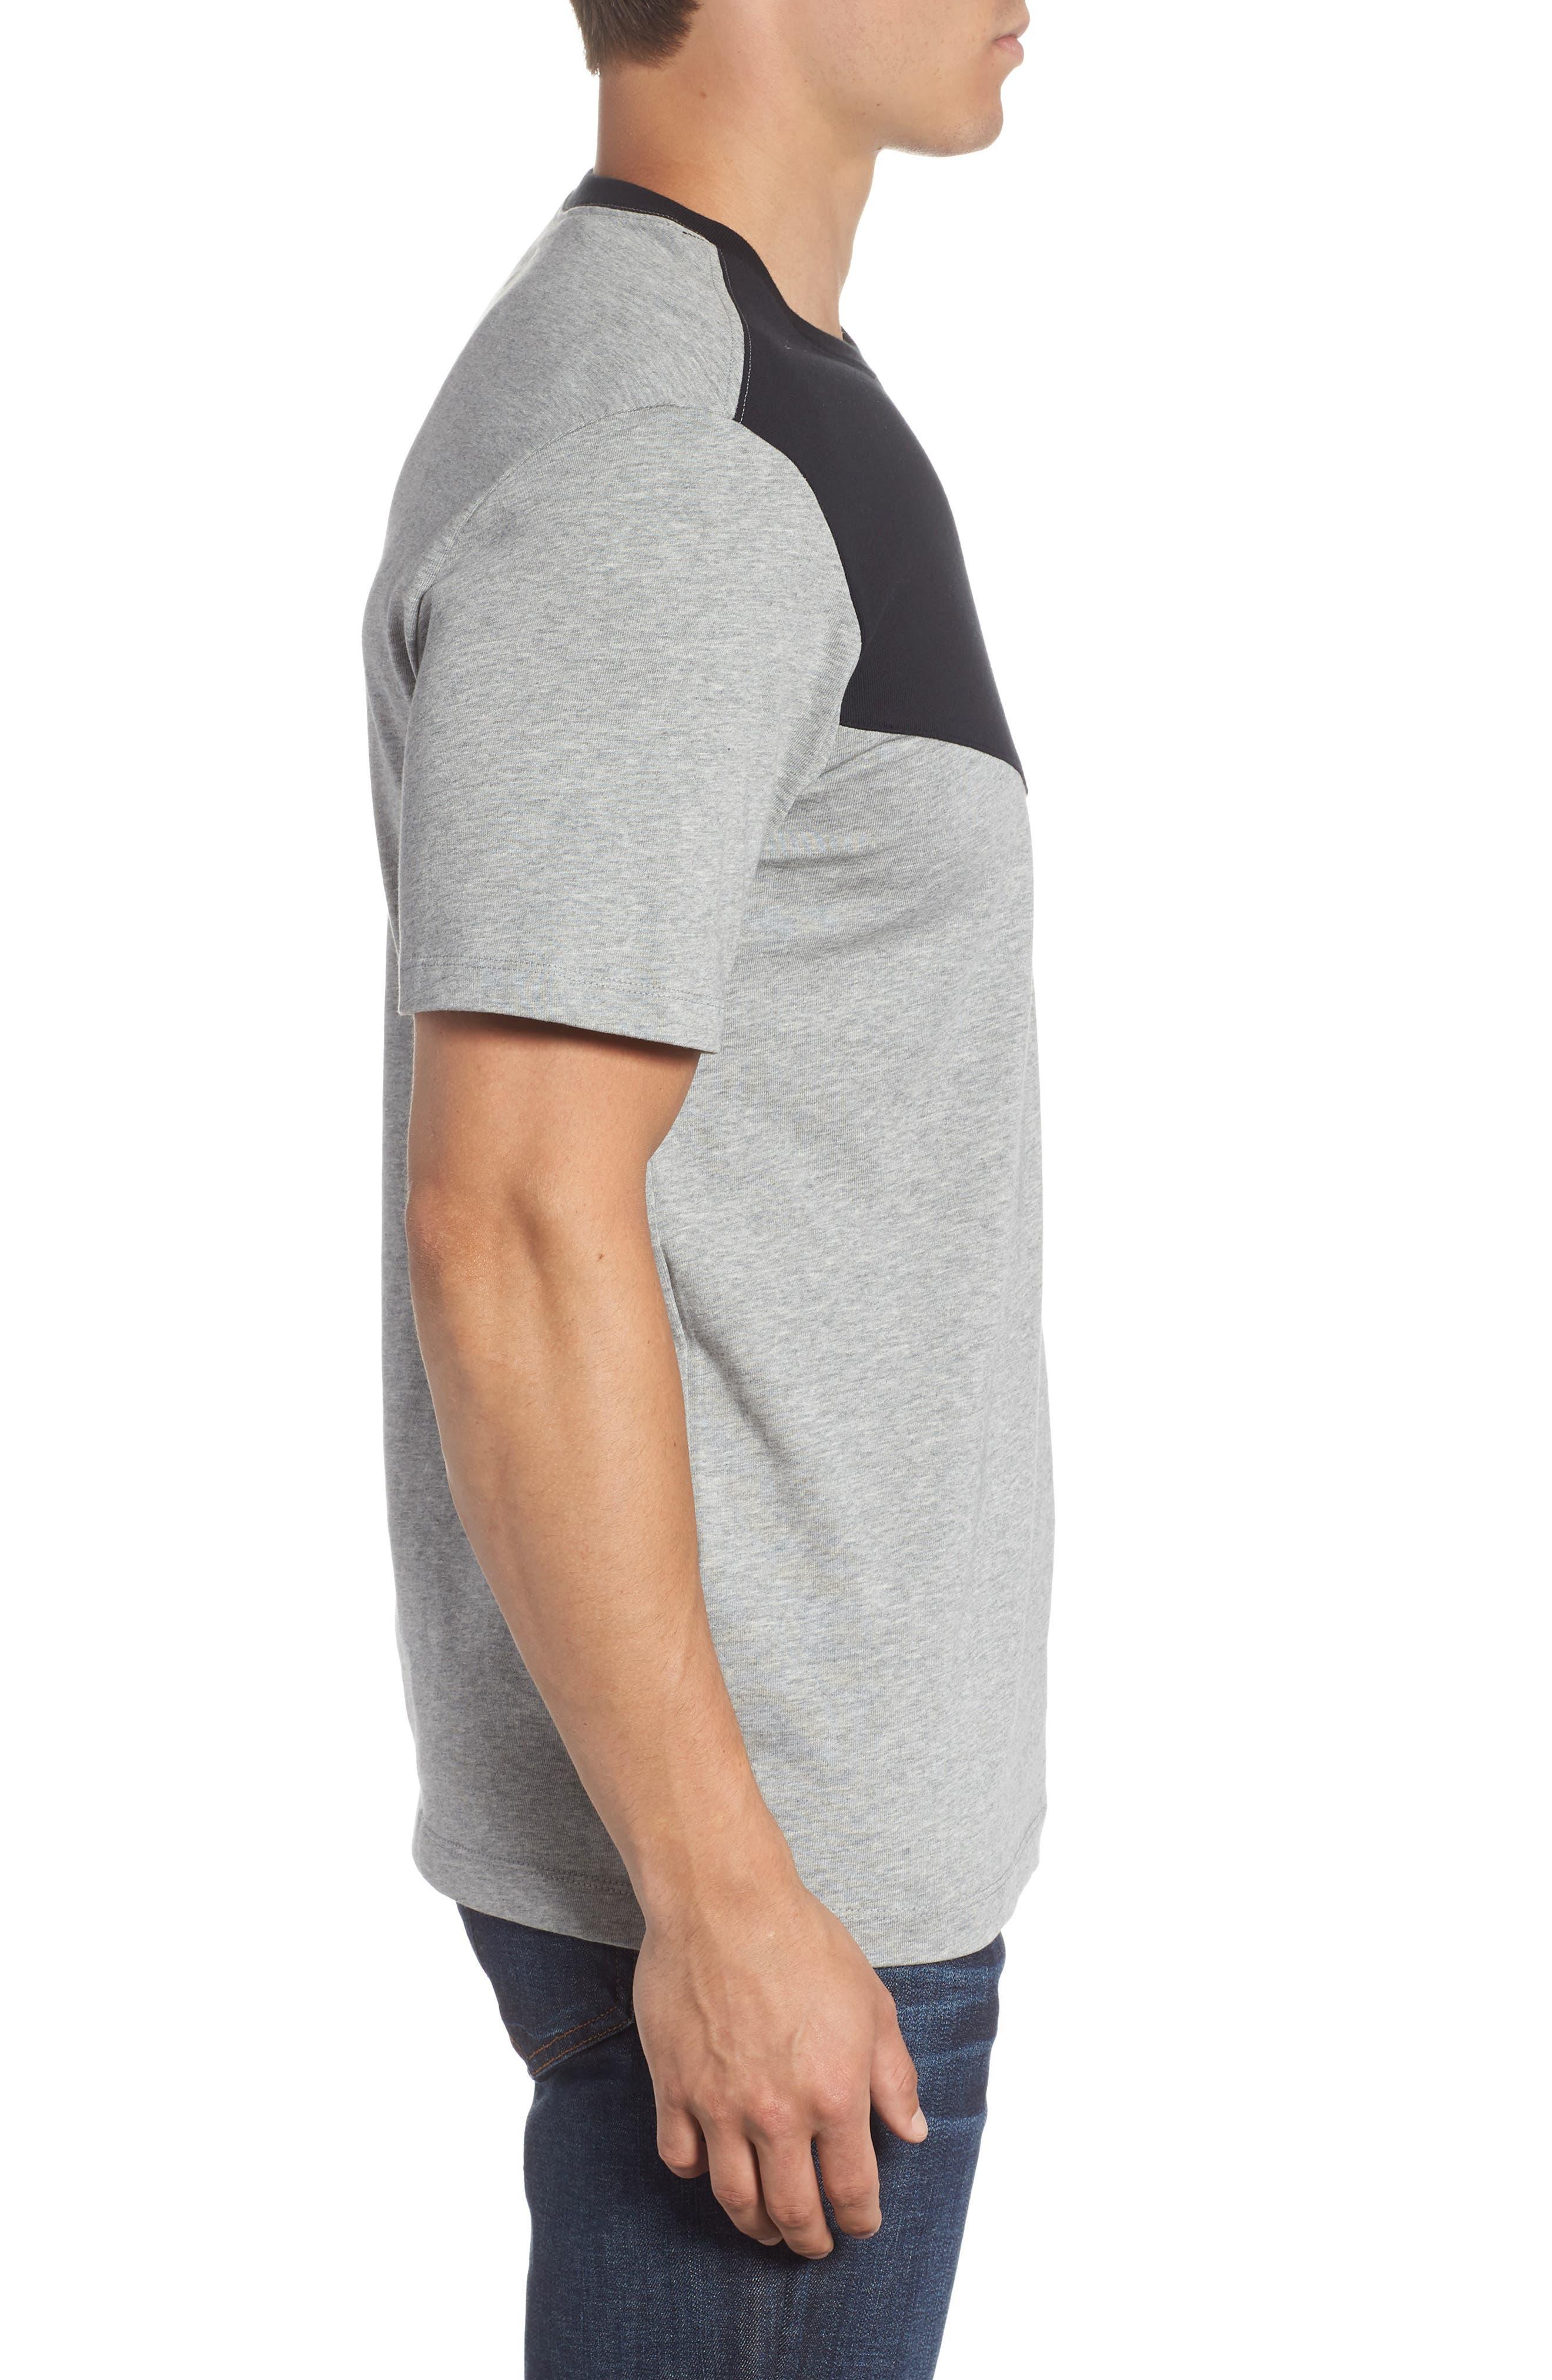 Windrunner Colorblocked T-Shirt,                             Alternate thumbnail 3, color,                             BLACK/ DK GREY HEATHER/ WHITE